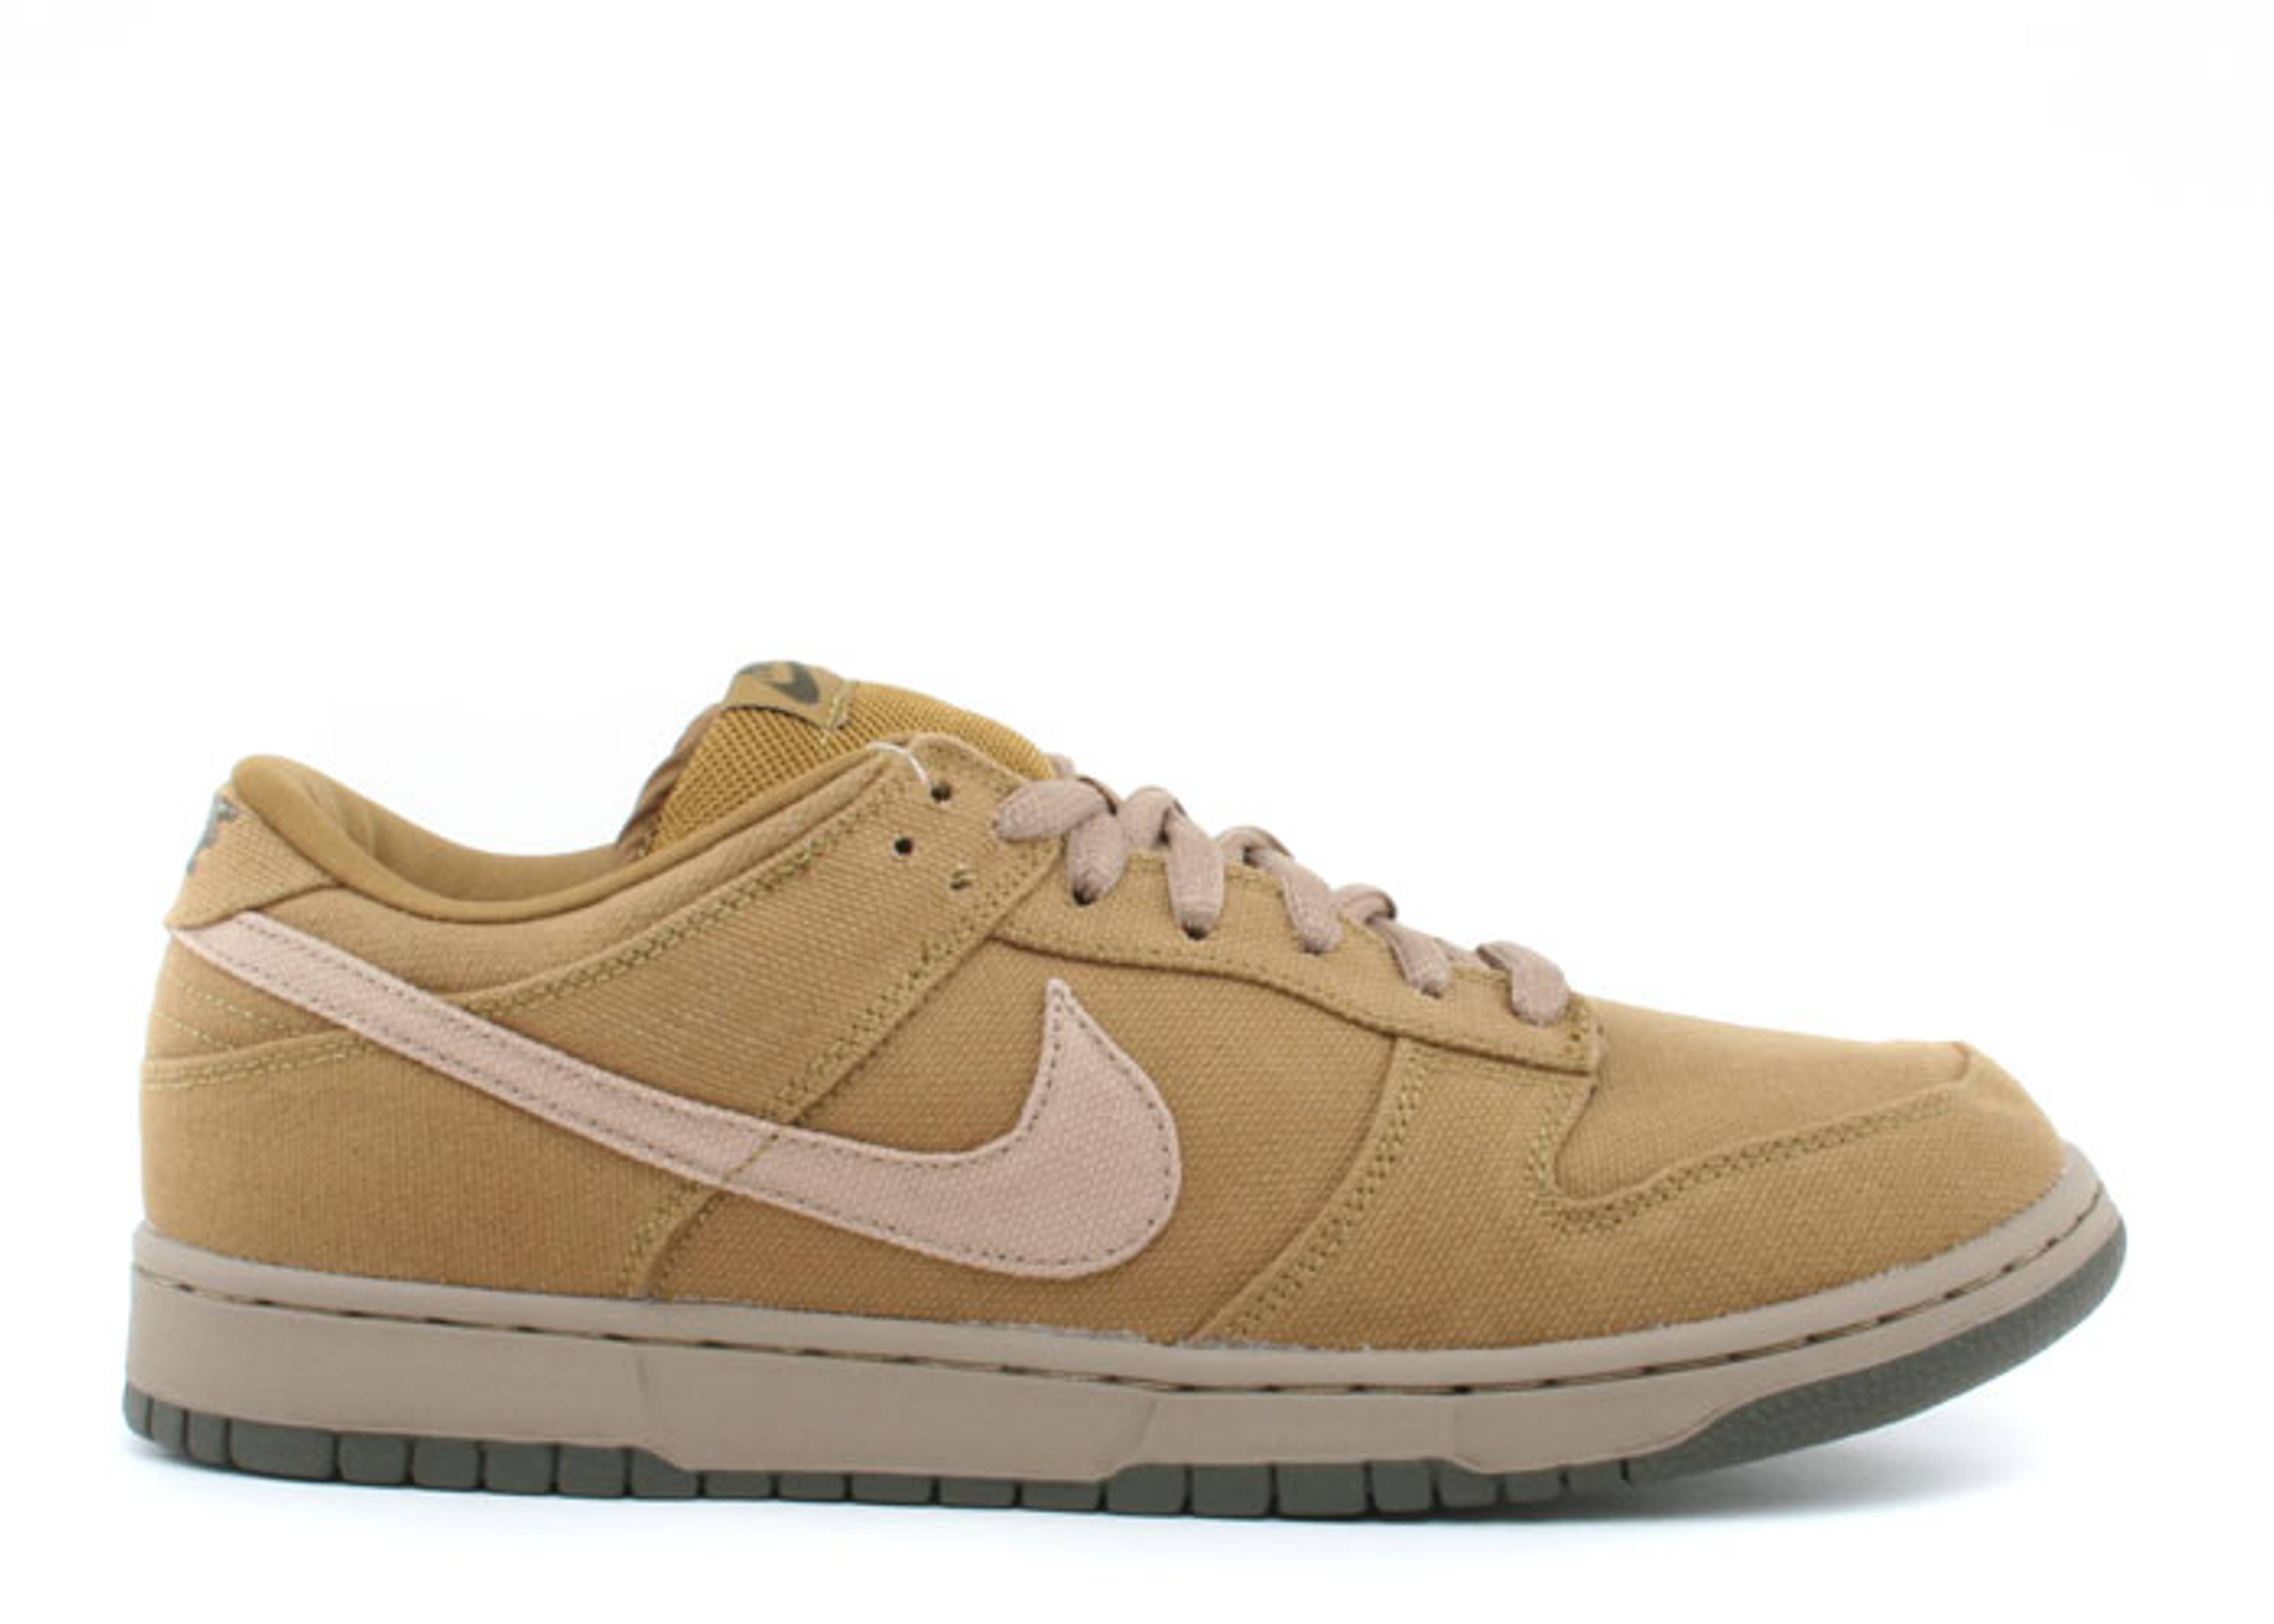 8df66470199b Dunk Low Pro Sb - Nike - 304292 321 - spanish moss sandalwood ...